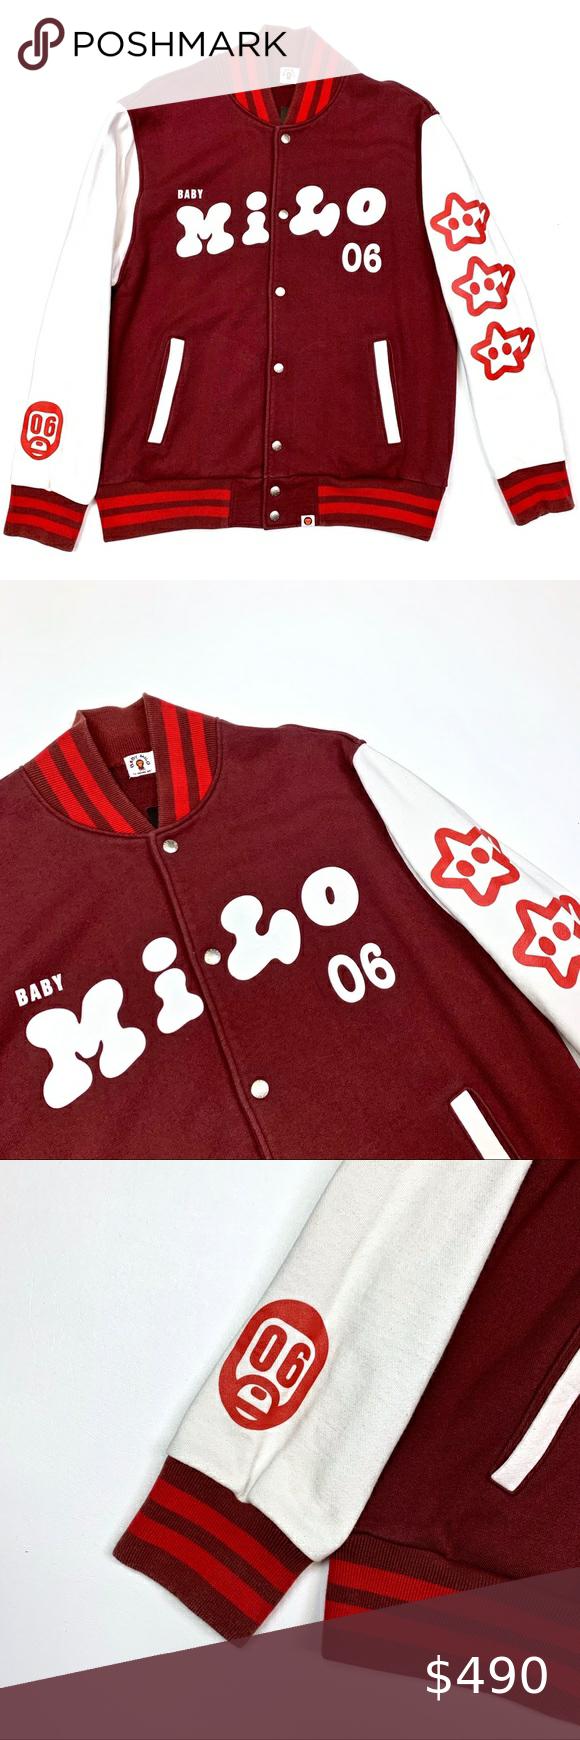 2006 Baby Milo Varsity Letterman Jacket M Medium in 2020